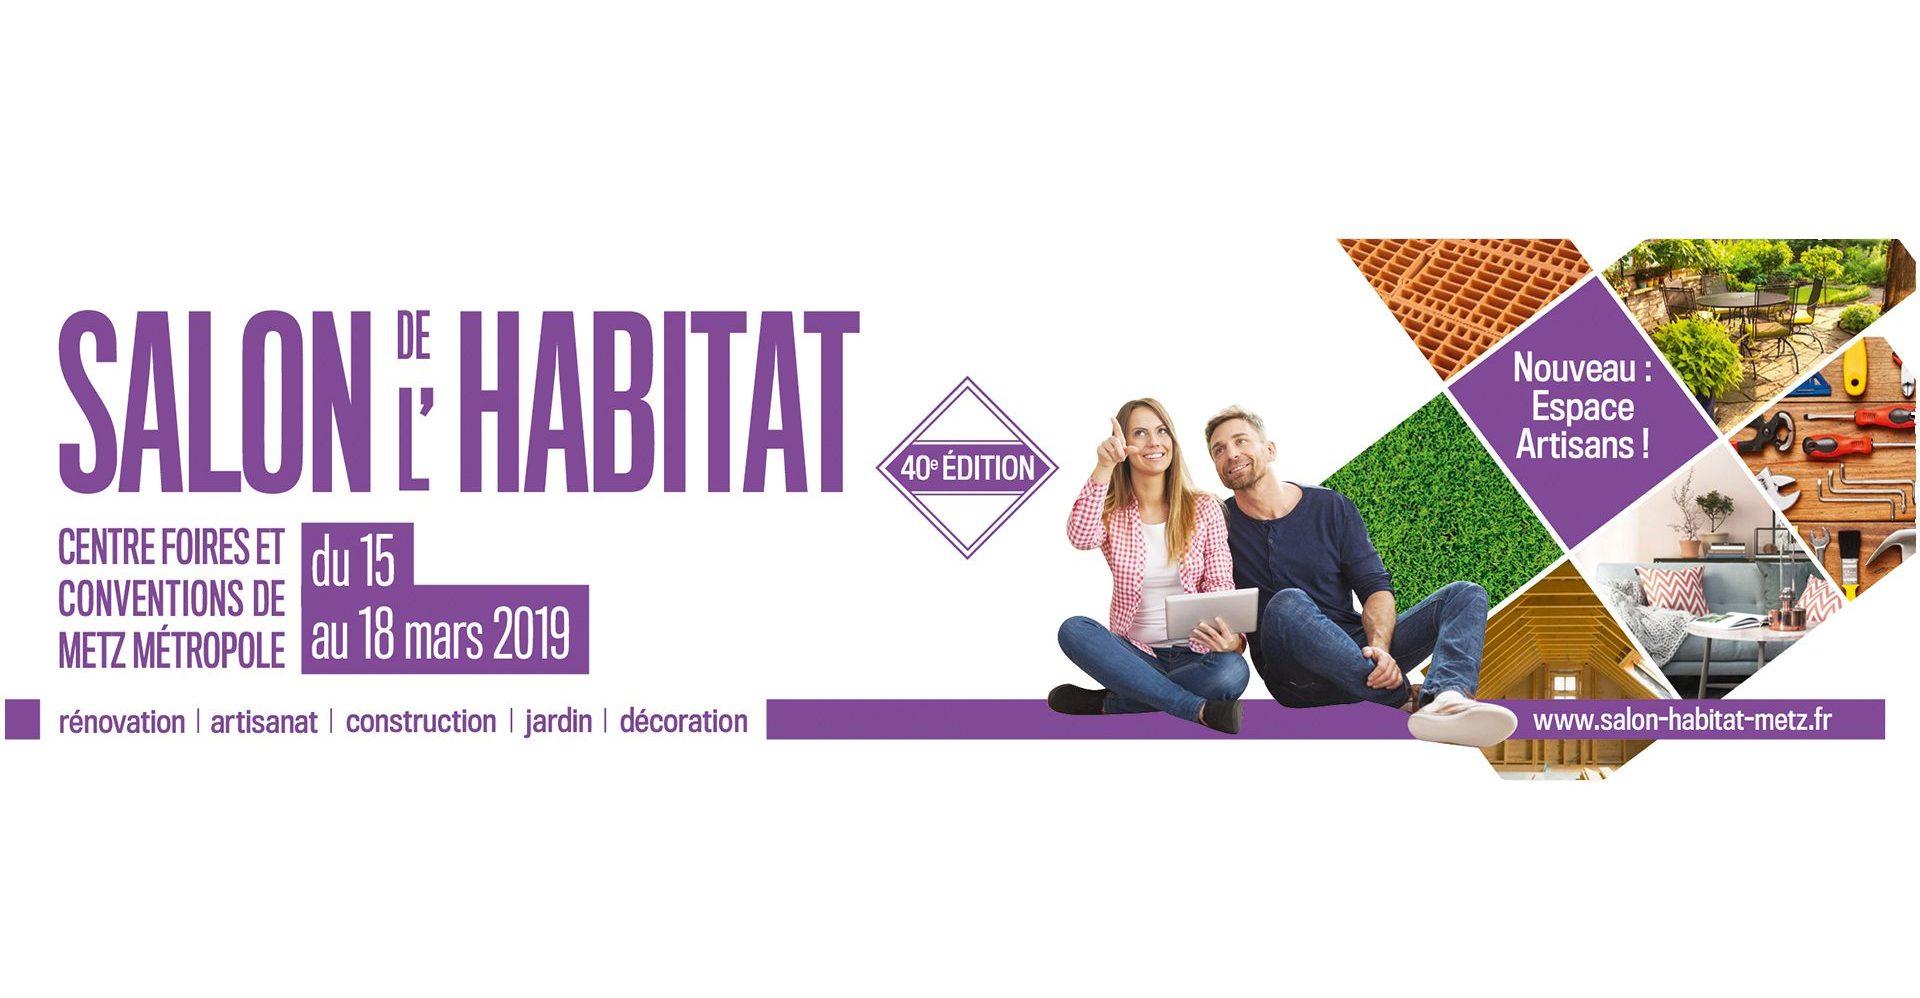 Salon de l'habitat 2019